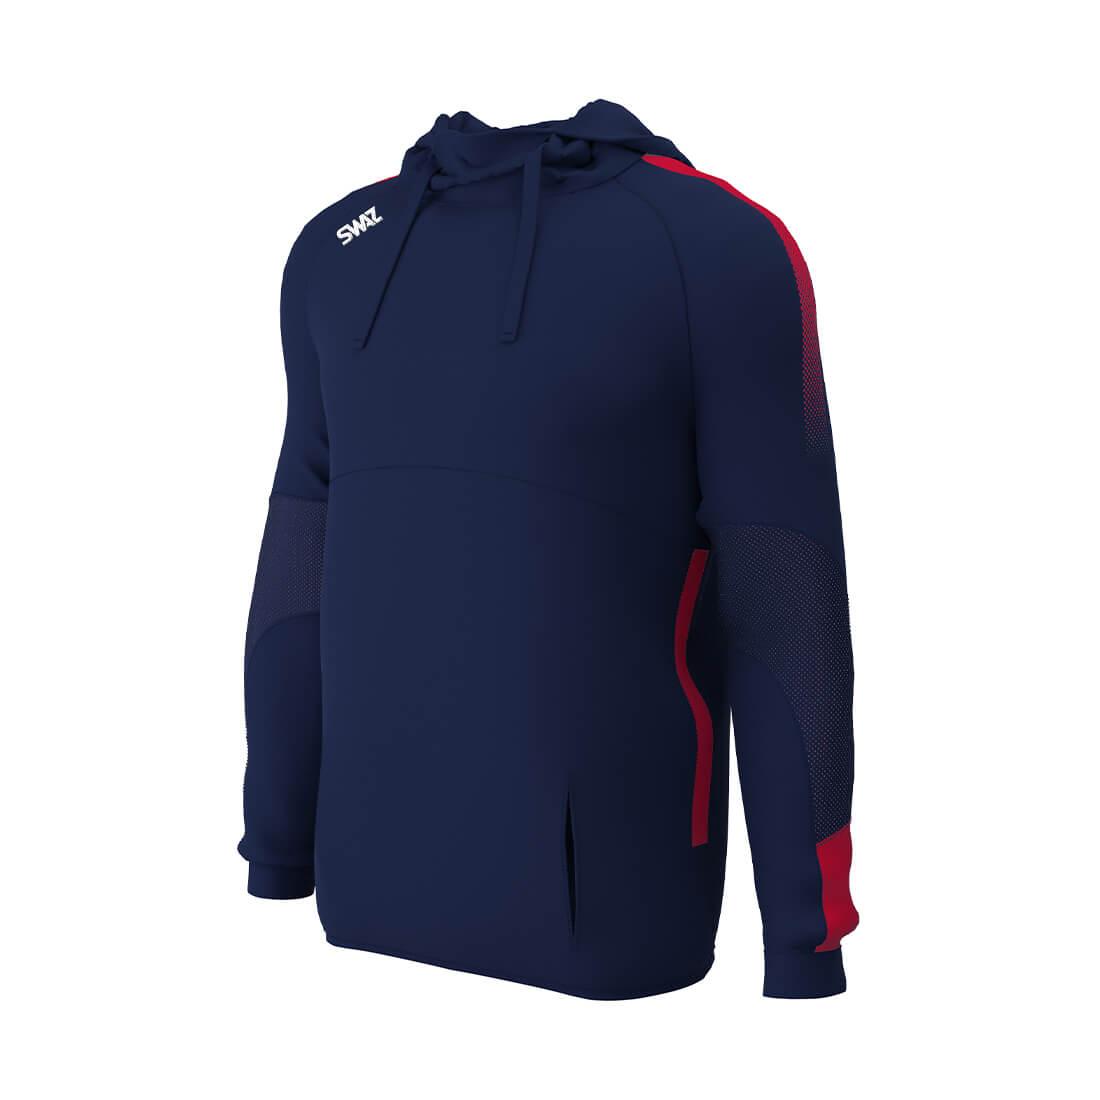 Elite Football Hoody | Football Training Kit and Teamwear – SWAZ